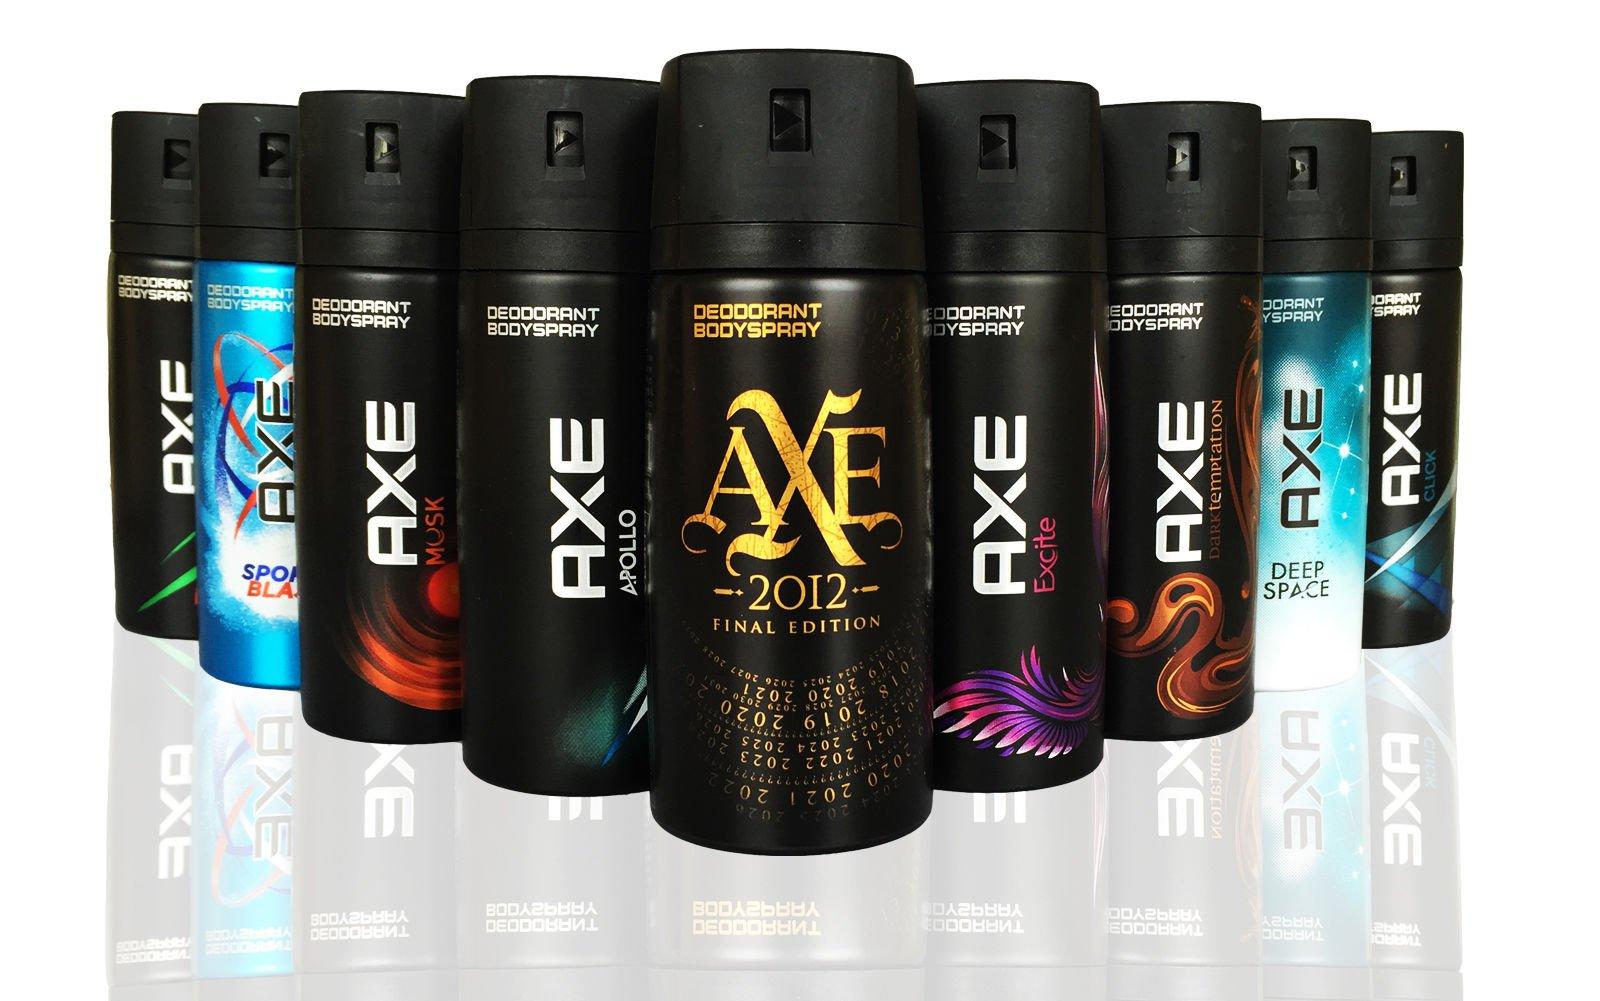 AXE Body Spray within available